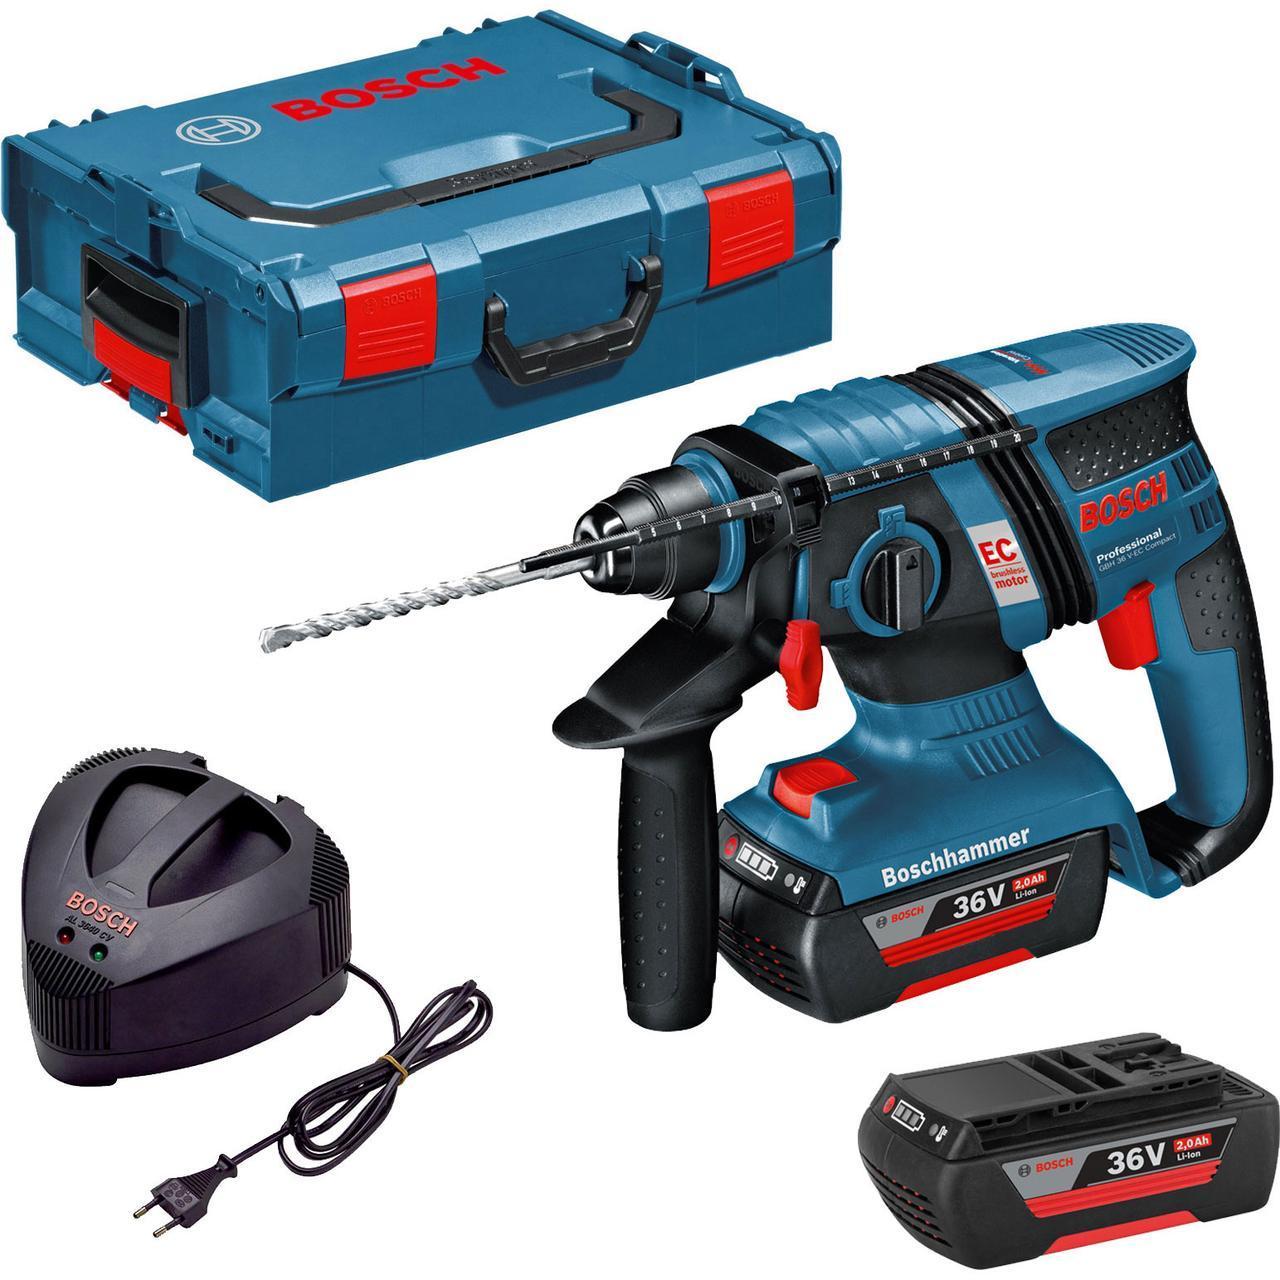 Перфоратор аккумуляторный Bosch GBH 36 V-Li Compact + оснастка + Кейс L-Boxx